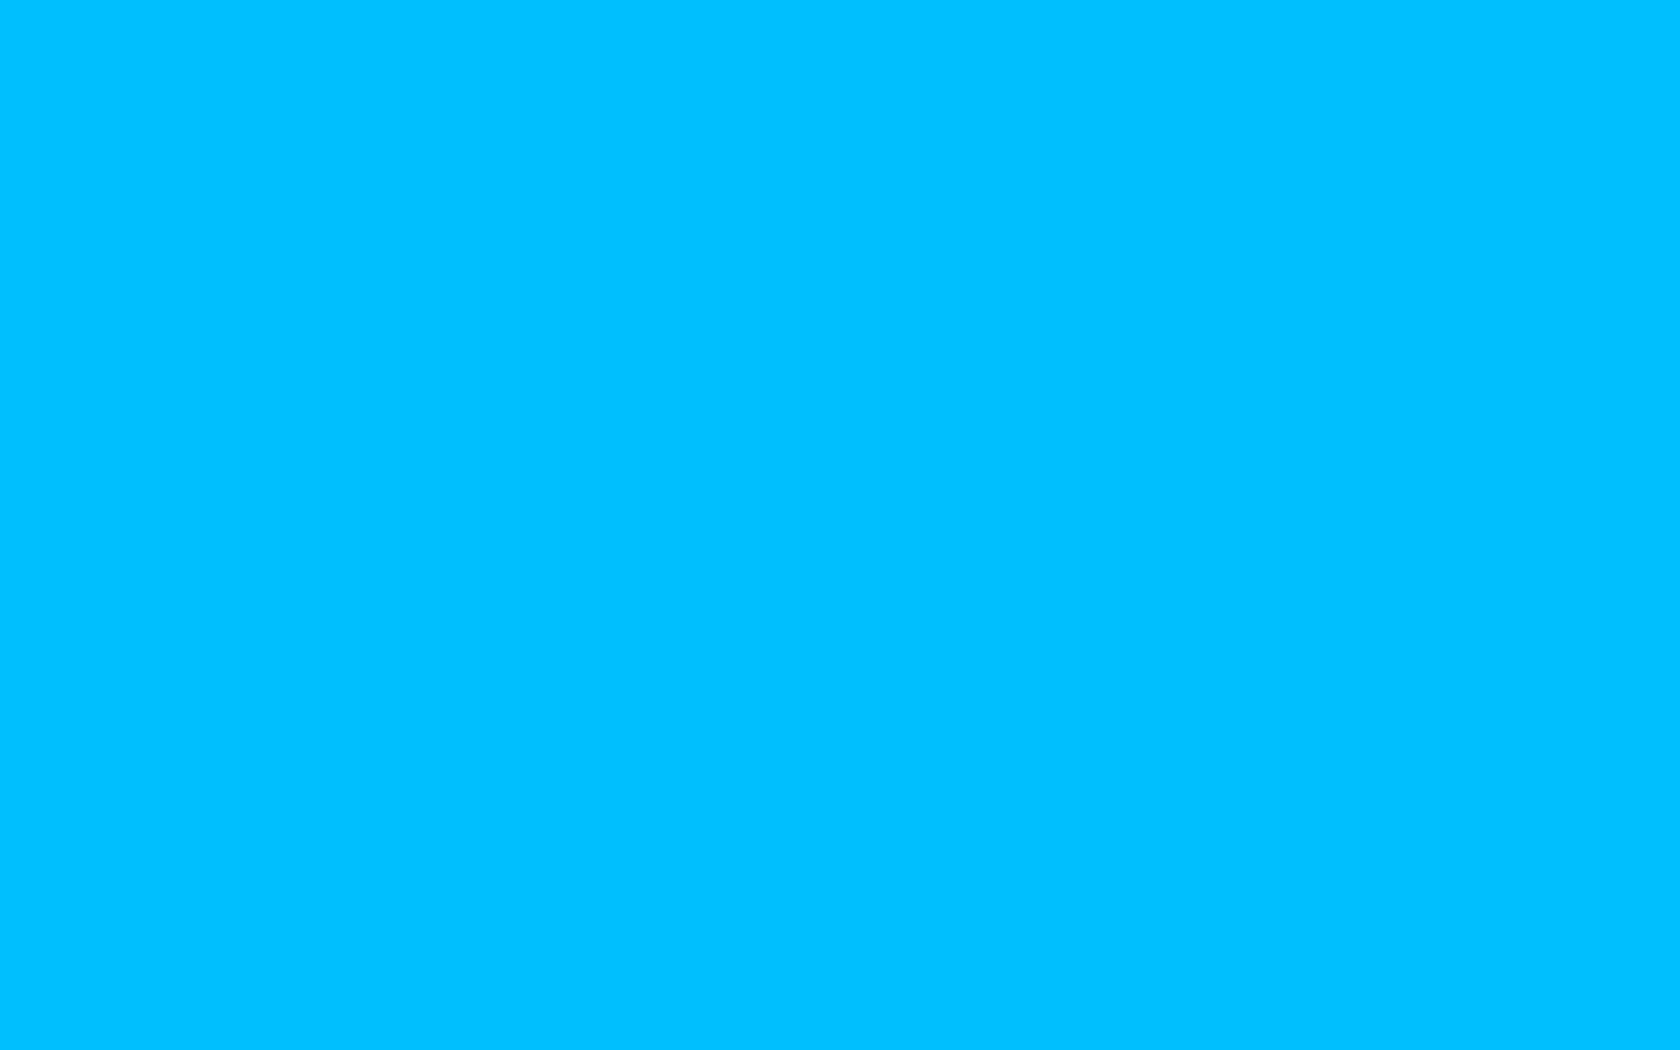 1680x1050 Deep Sky Blue Solid Color Background